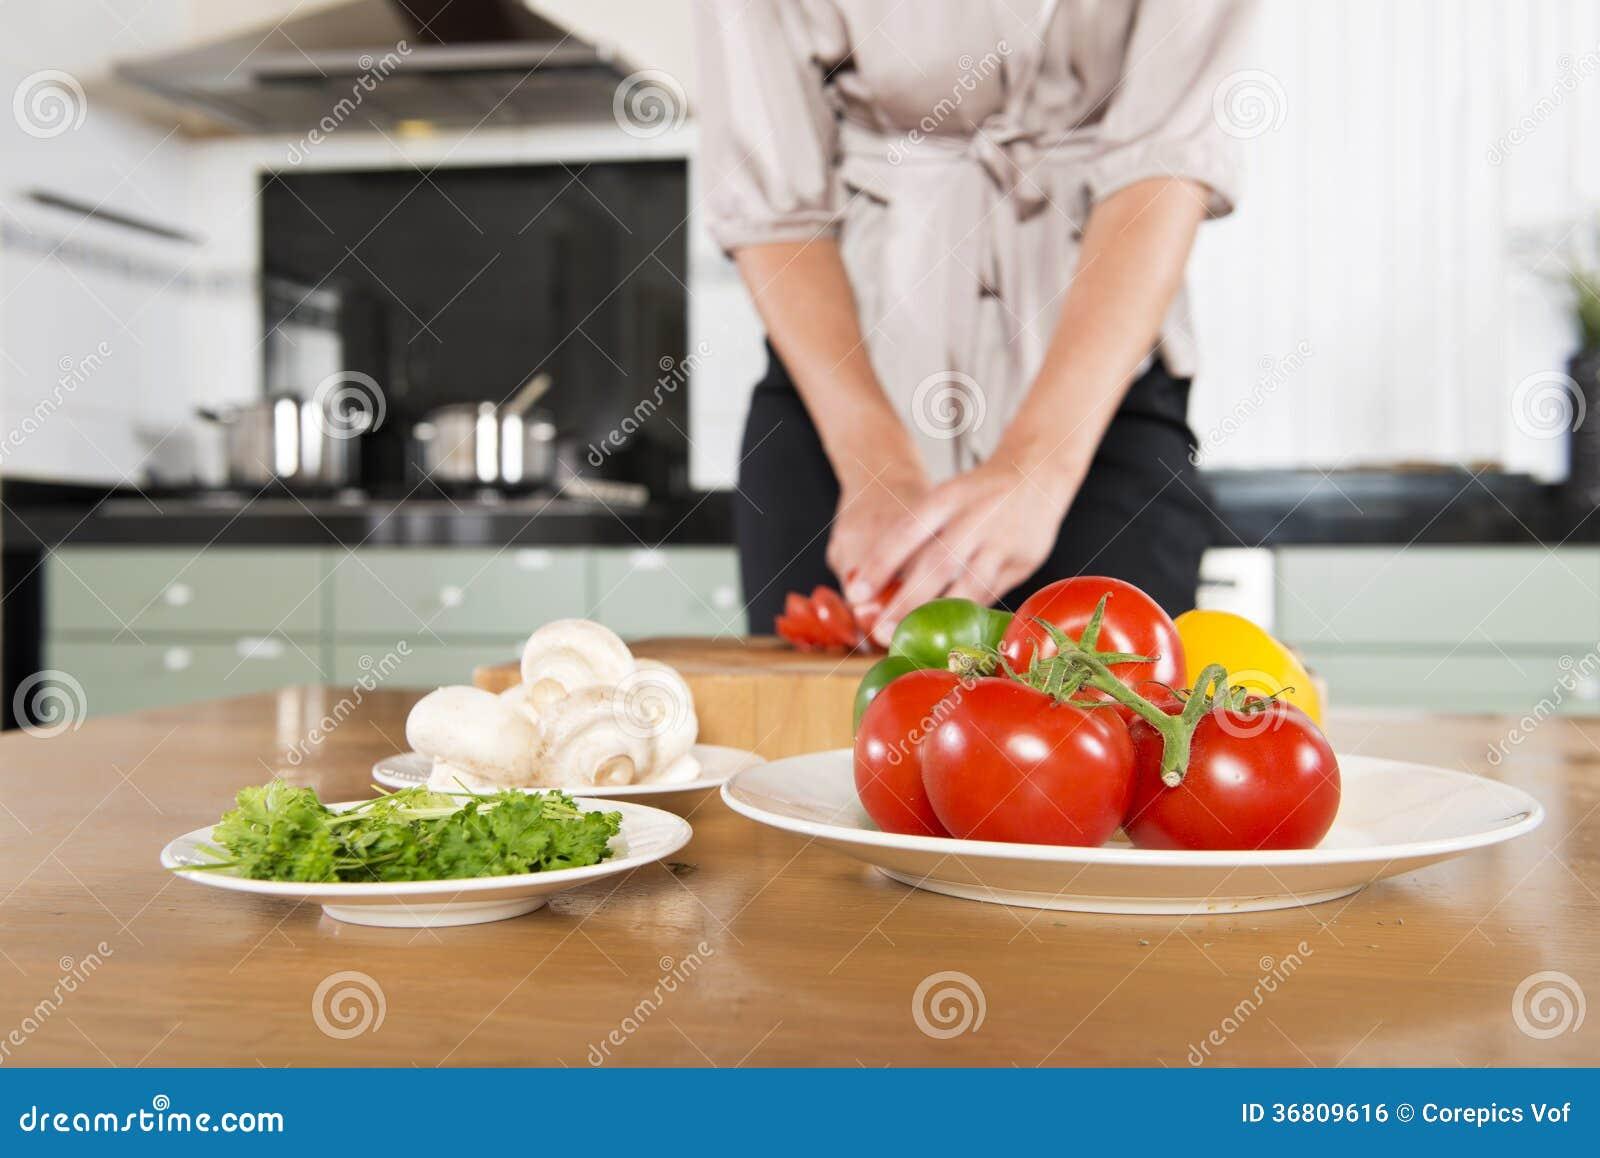 Cutting fresh ingredients